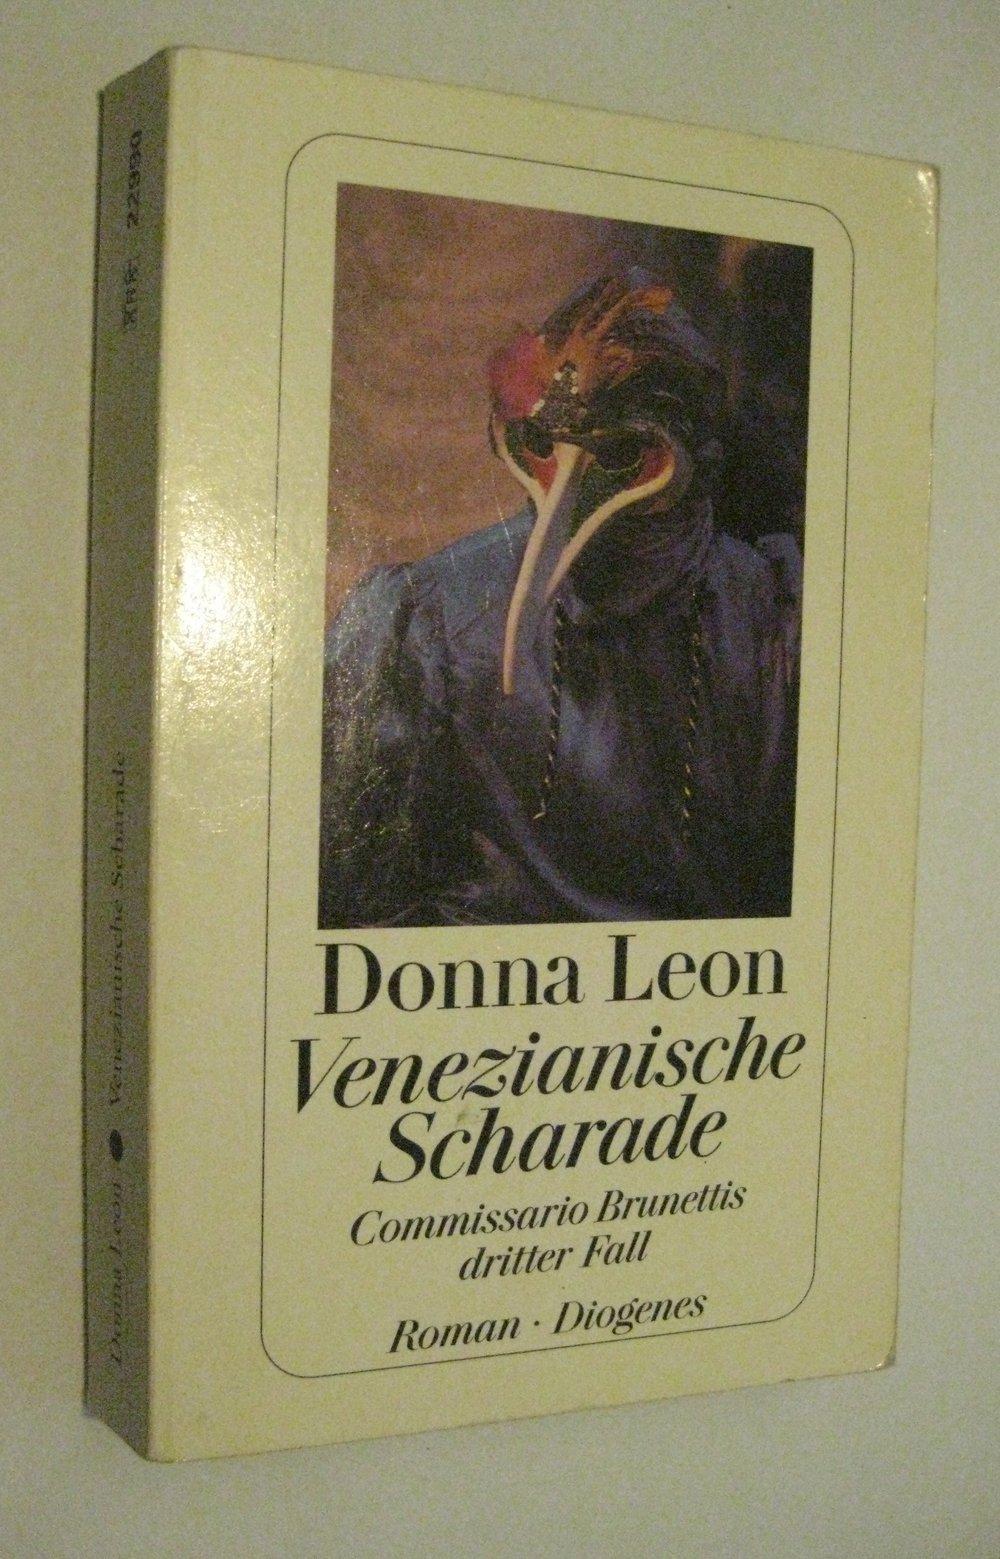 Donna Leon Venezianische Scharade